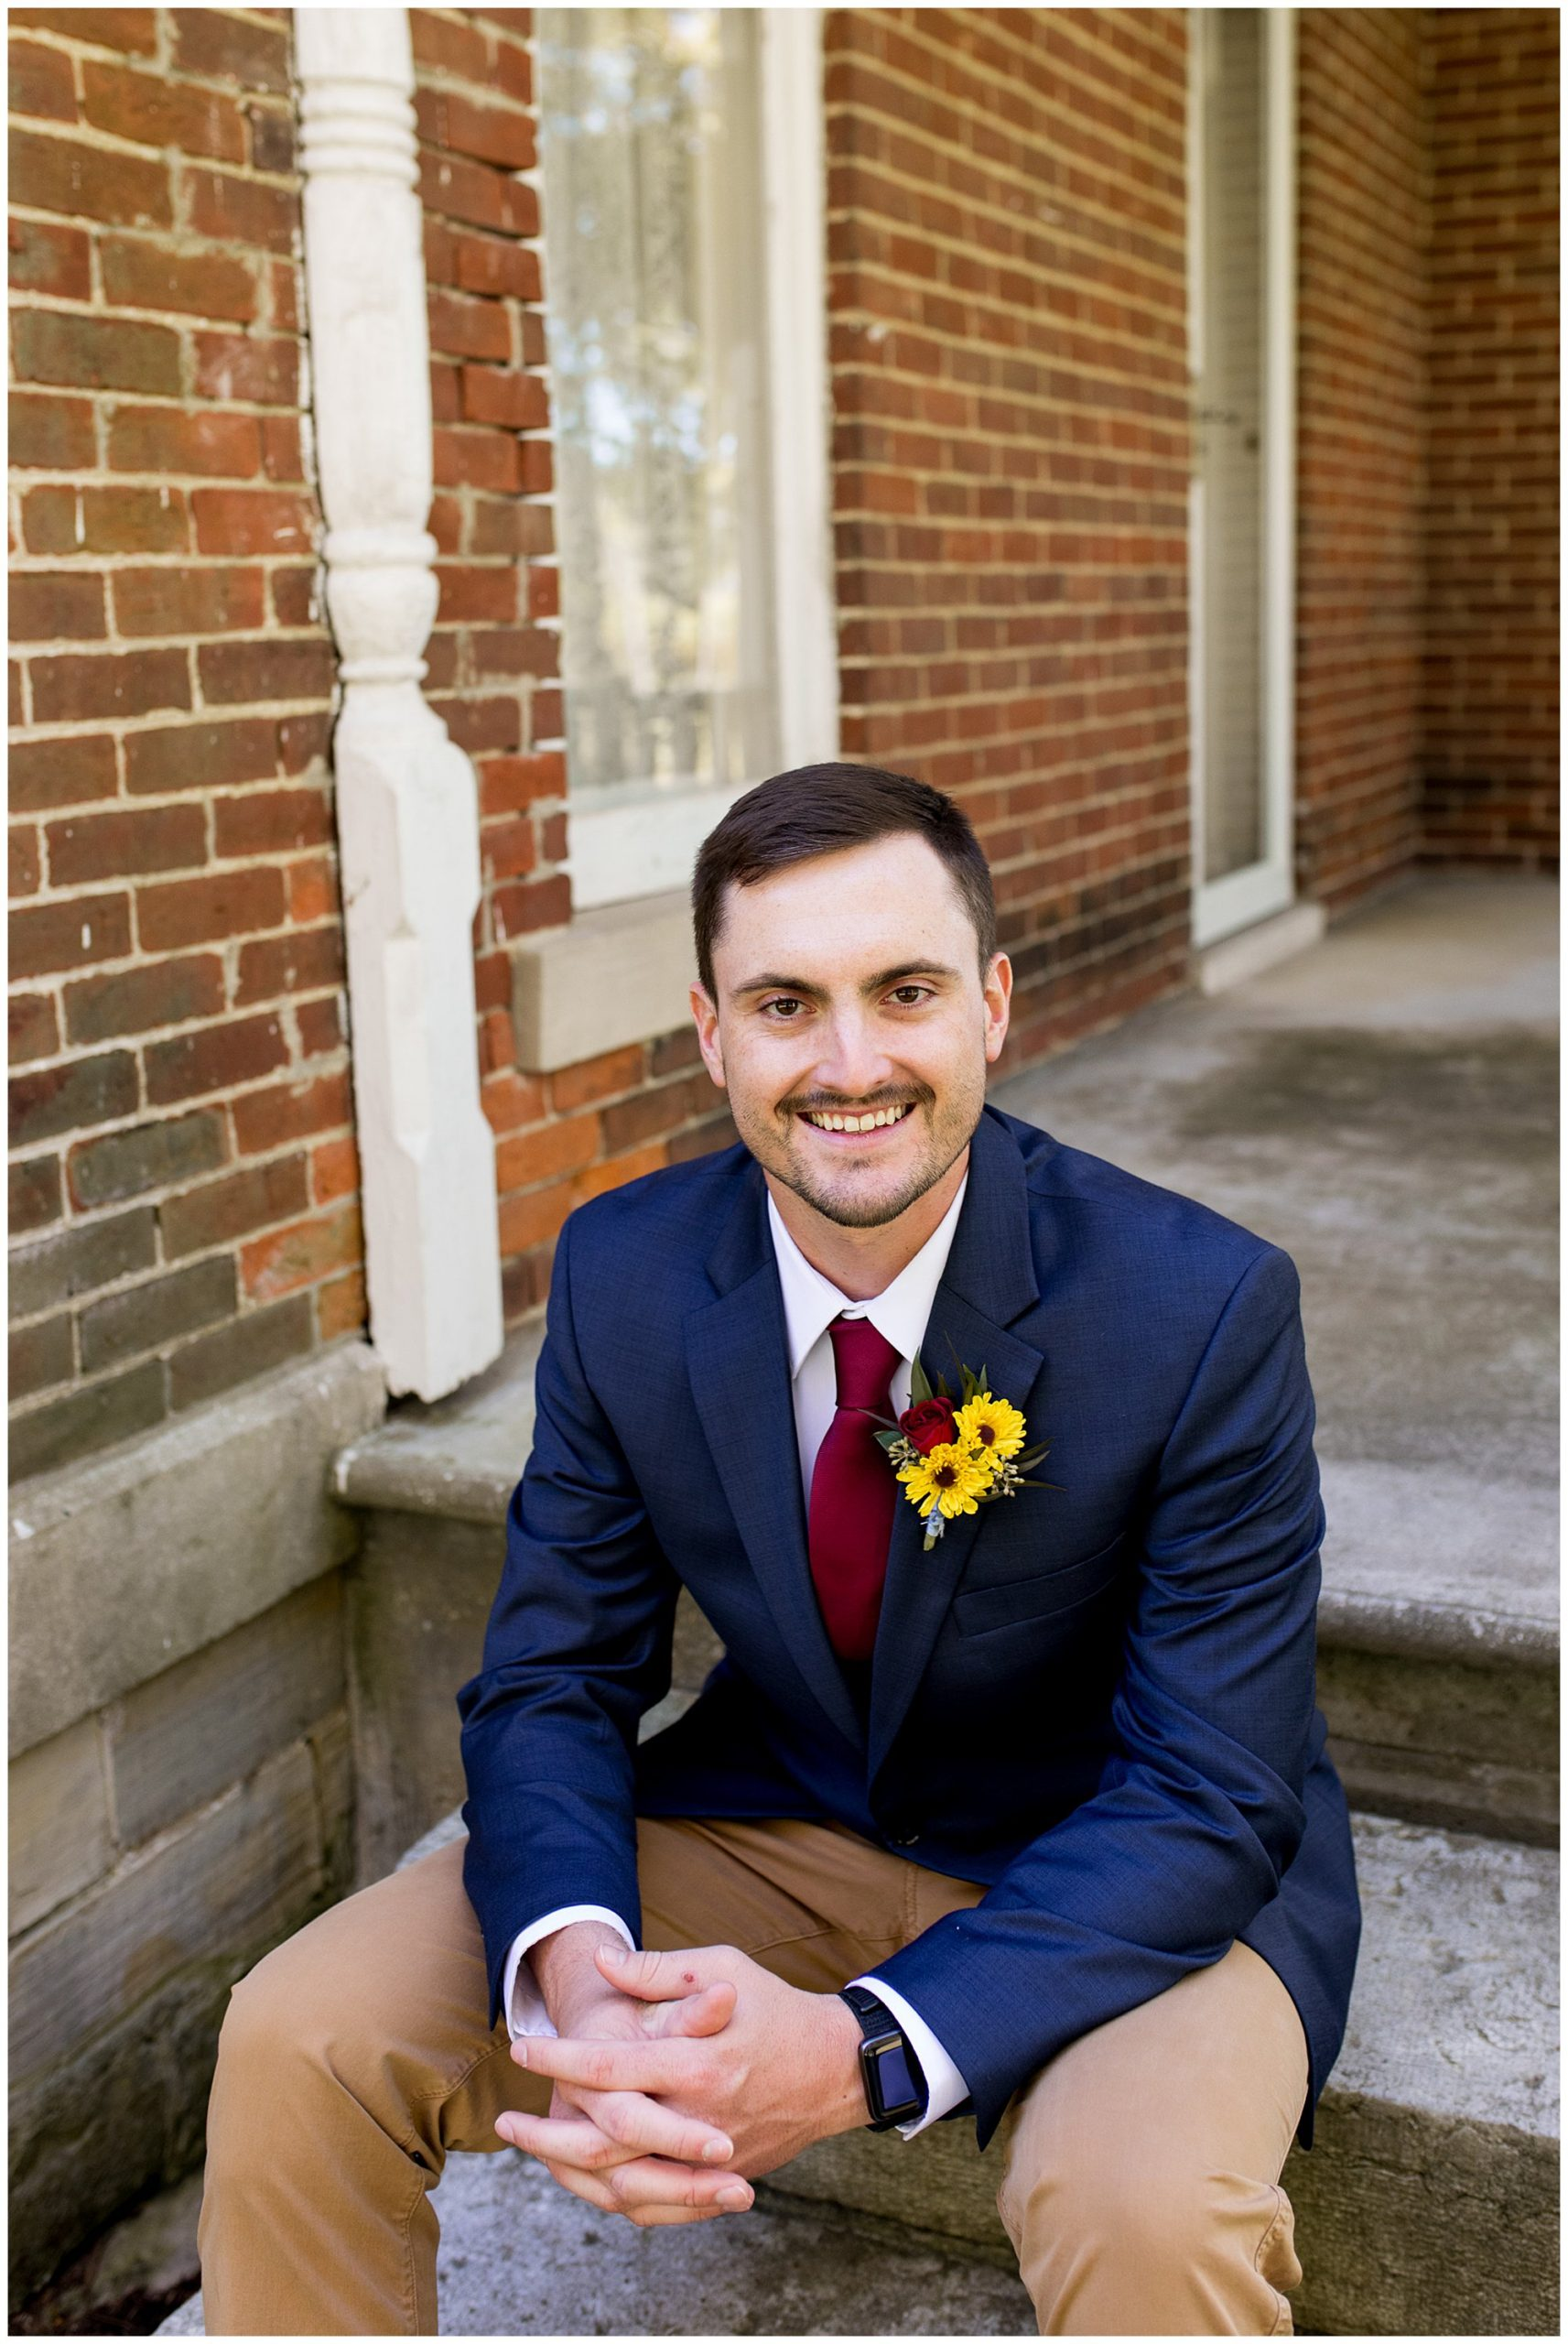 groom wedding photos before ceremony at Legacy Barn Kokomo Indiana